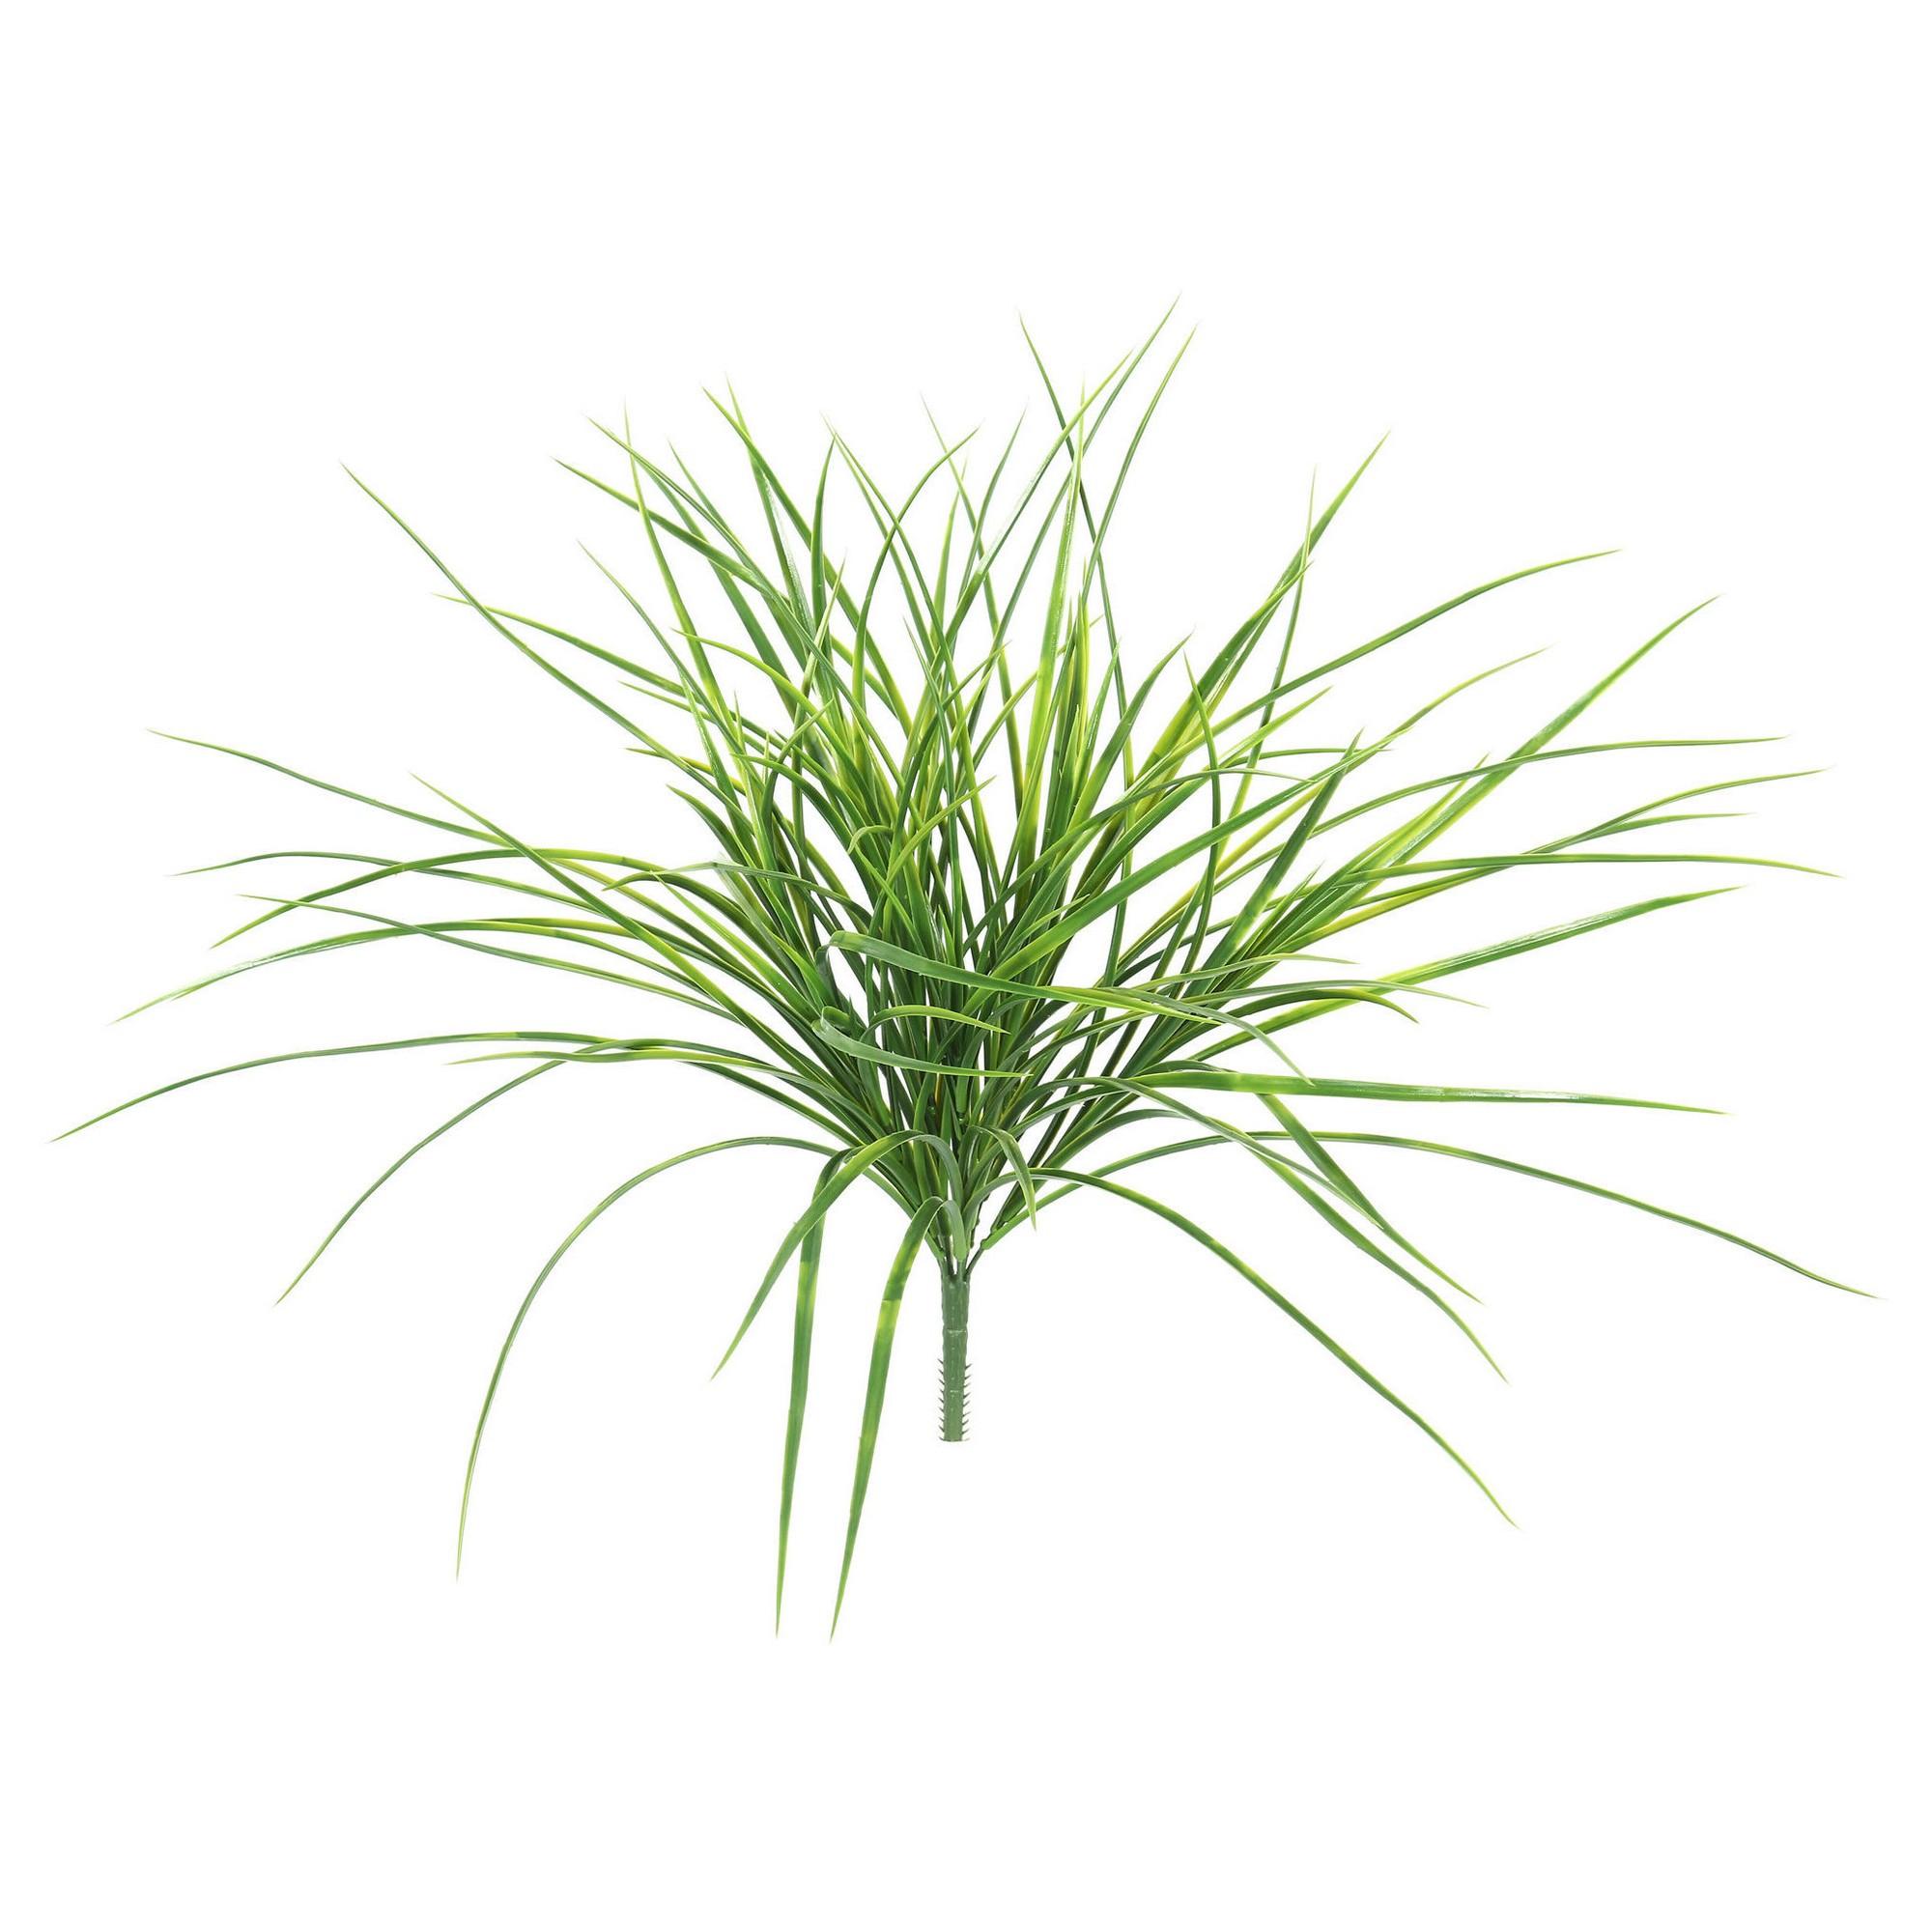 2000x2000 Artificial Plastic Grass Bush (20) Green